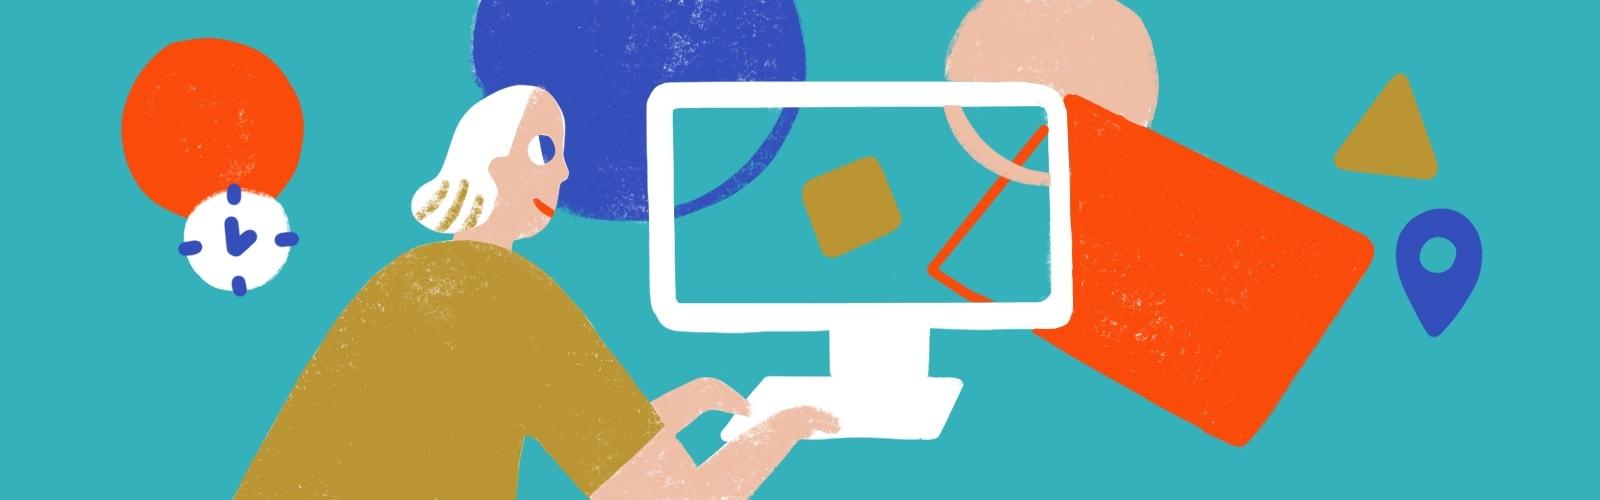 "Illustration für ""Digital Learning-Die Zukunft des Lernens"""